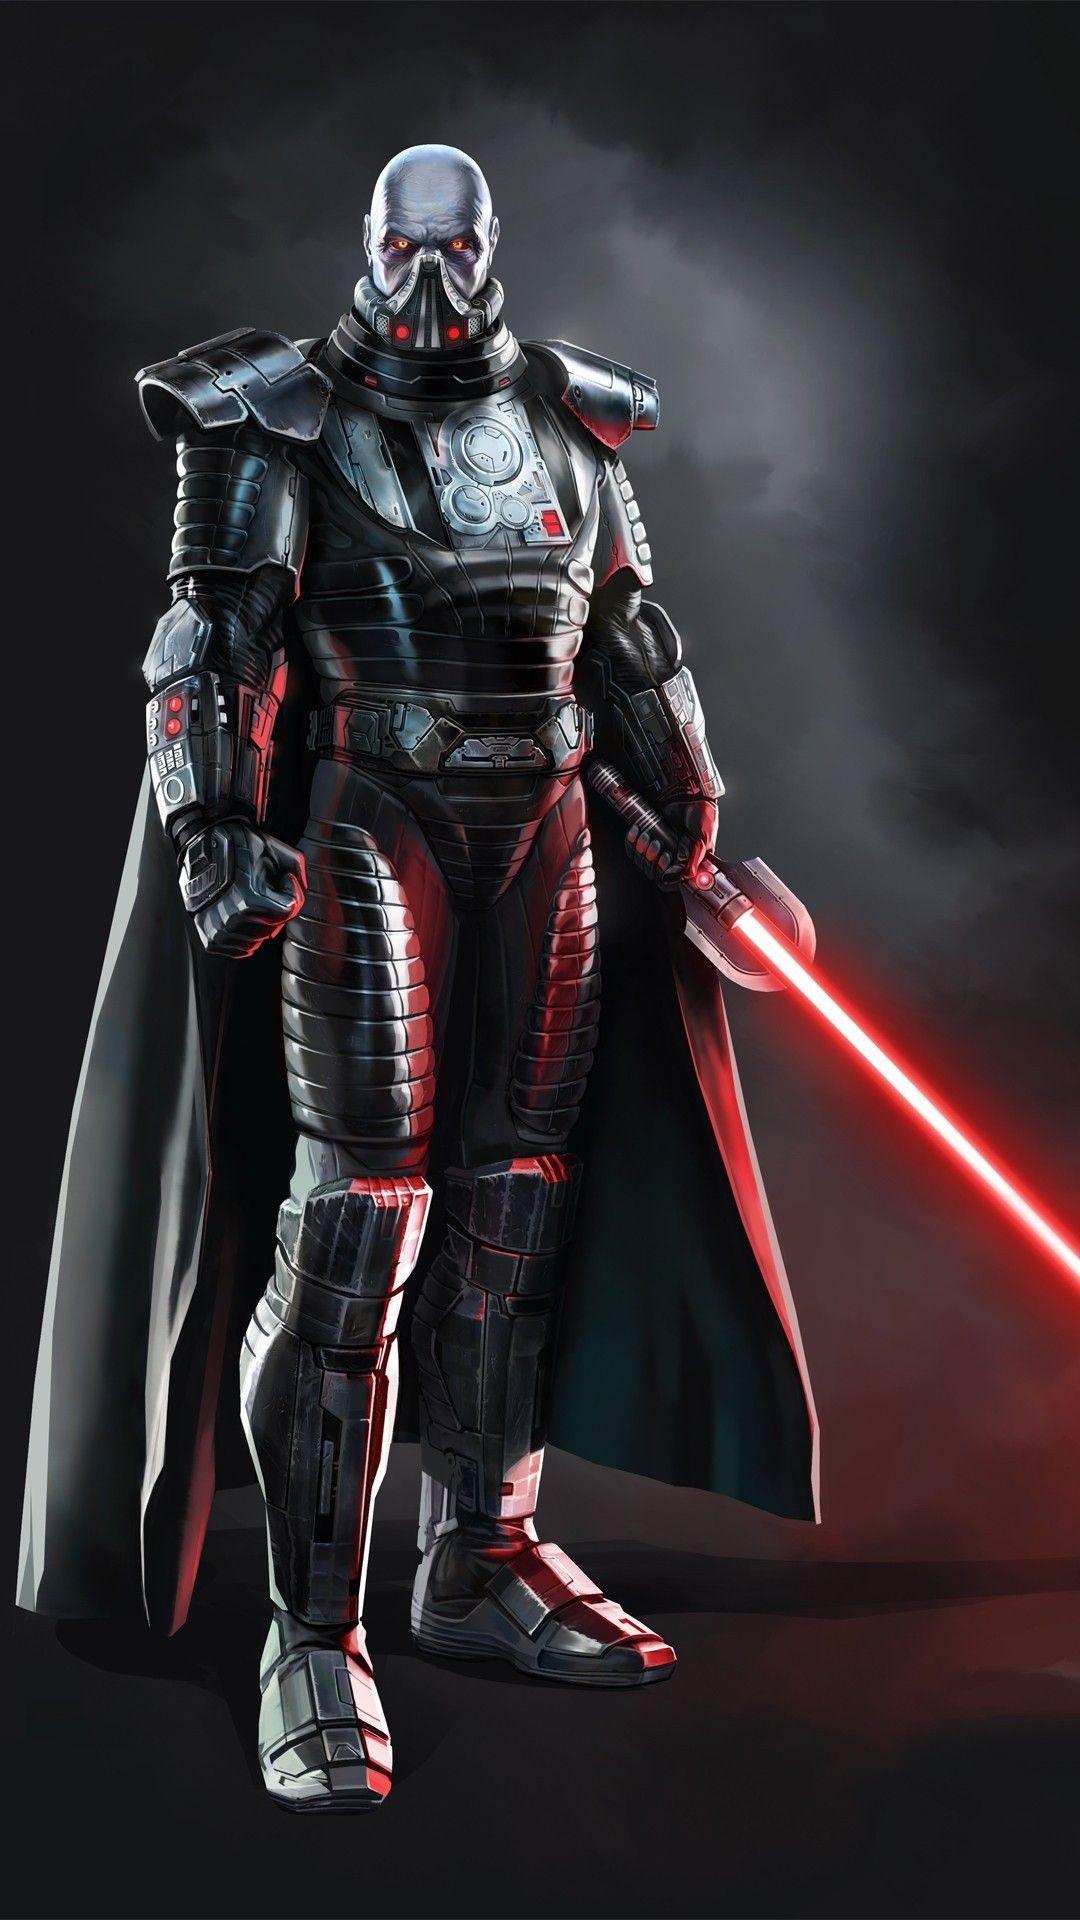 https://wallpapercave.com/wp/x9fgVcn.jpg Darth Malgus Vs Darth Vader